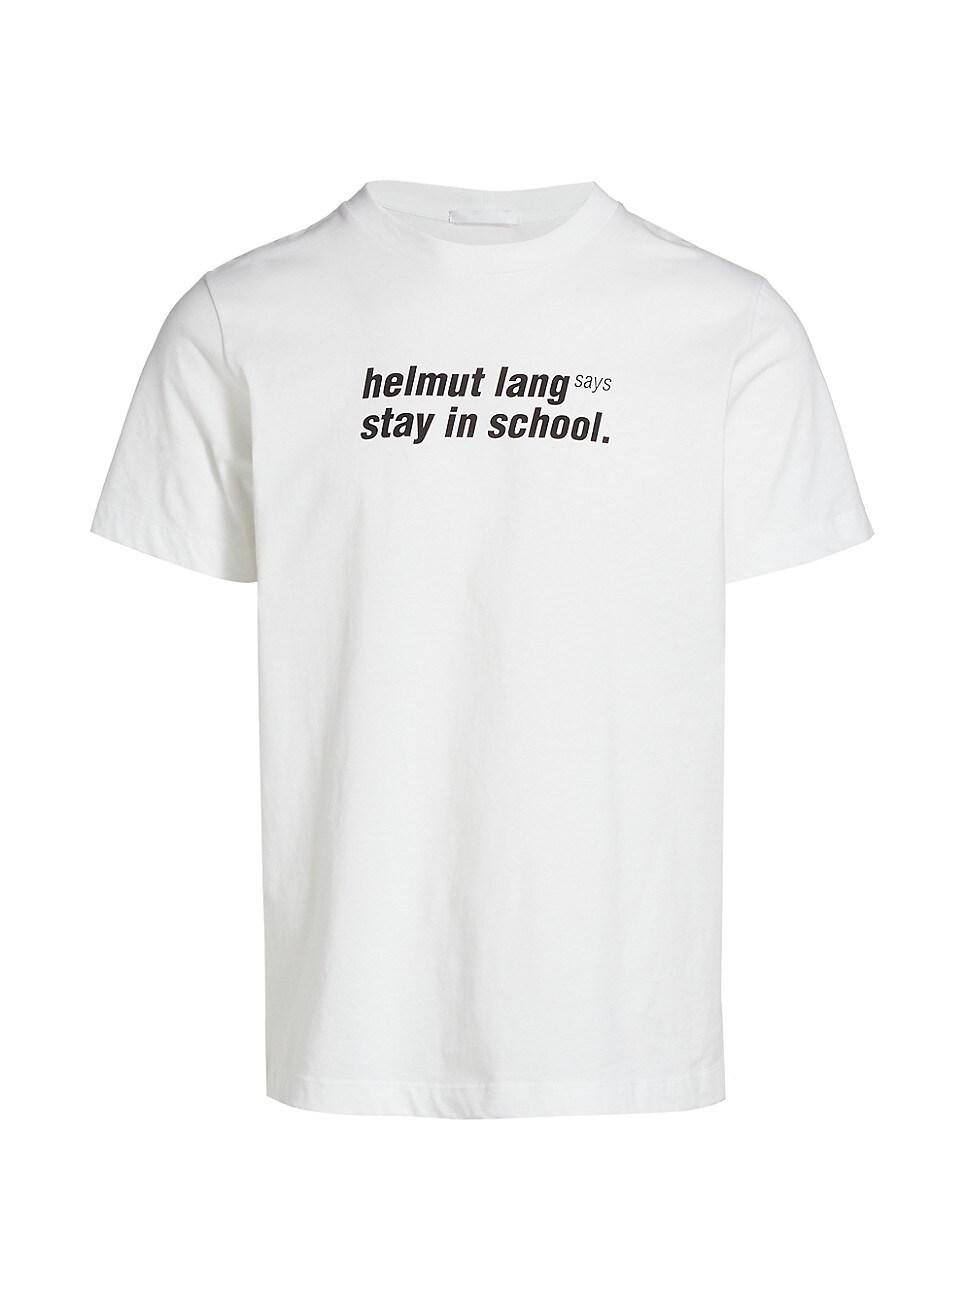 Helmut Lang MEN'S SCHOOL GRAPHIC T-SHIRT